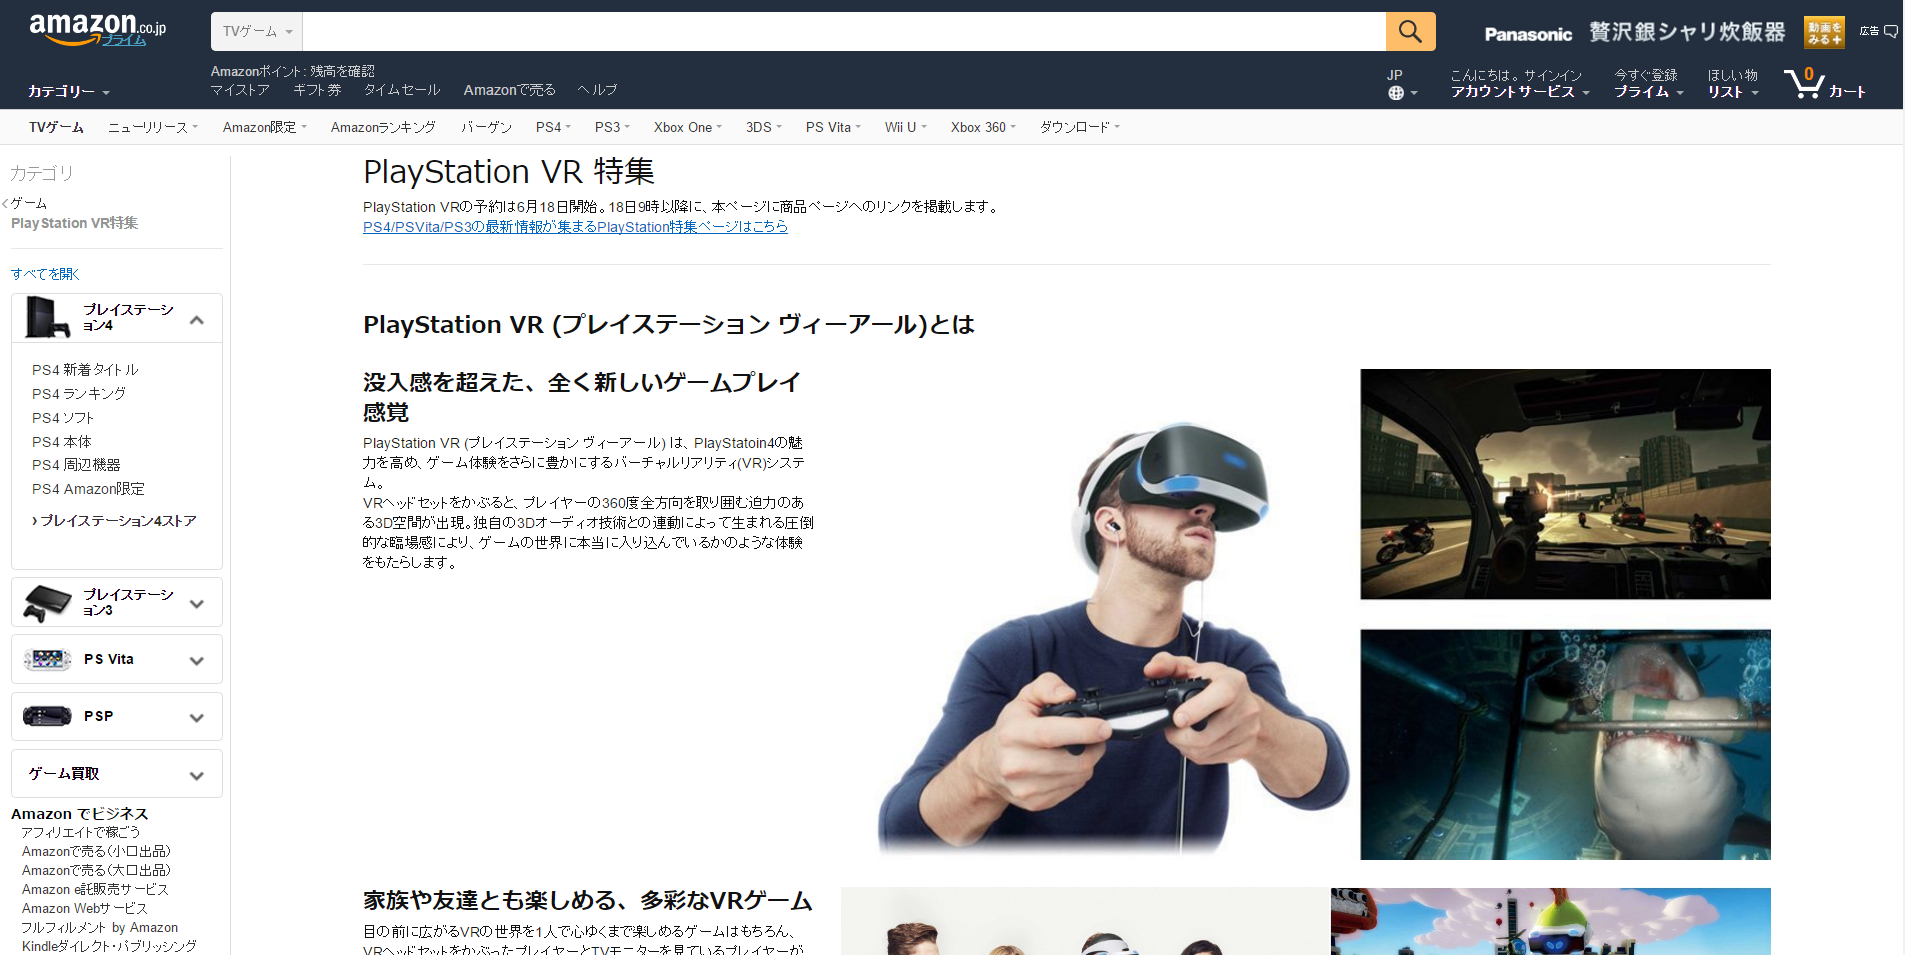 PlayStationVR 予約 amazon